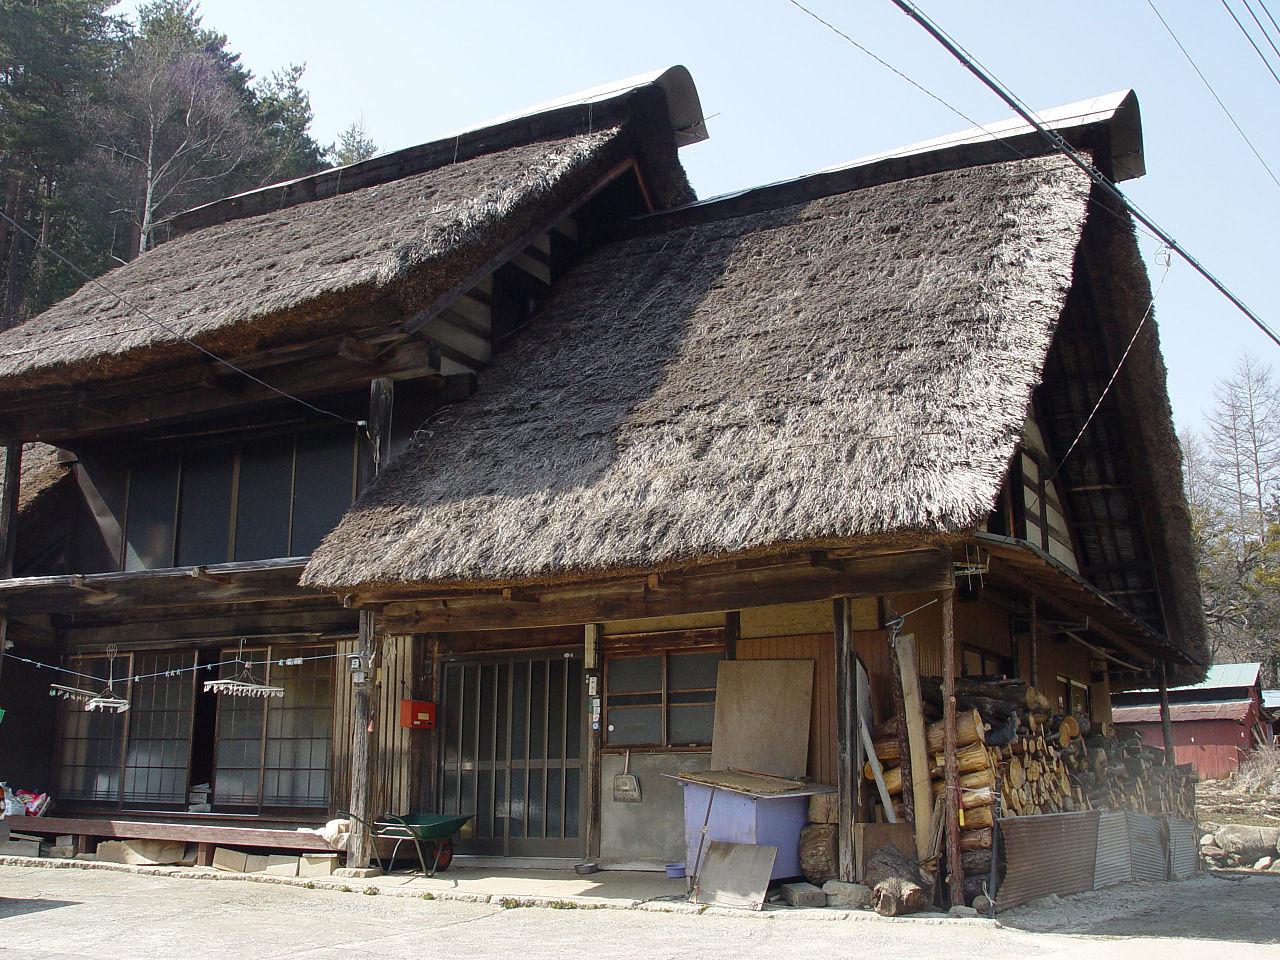 Datei:Thatched roof in Ichinose, Enzan, Yamanashi.jpg